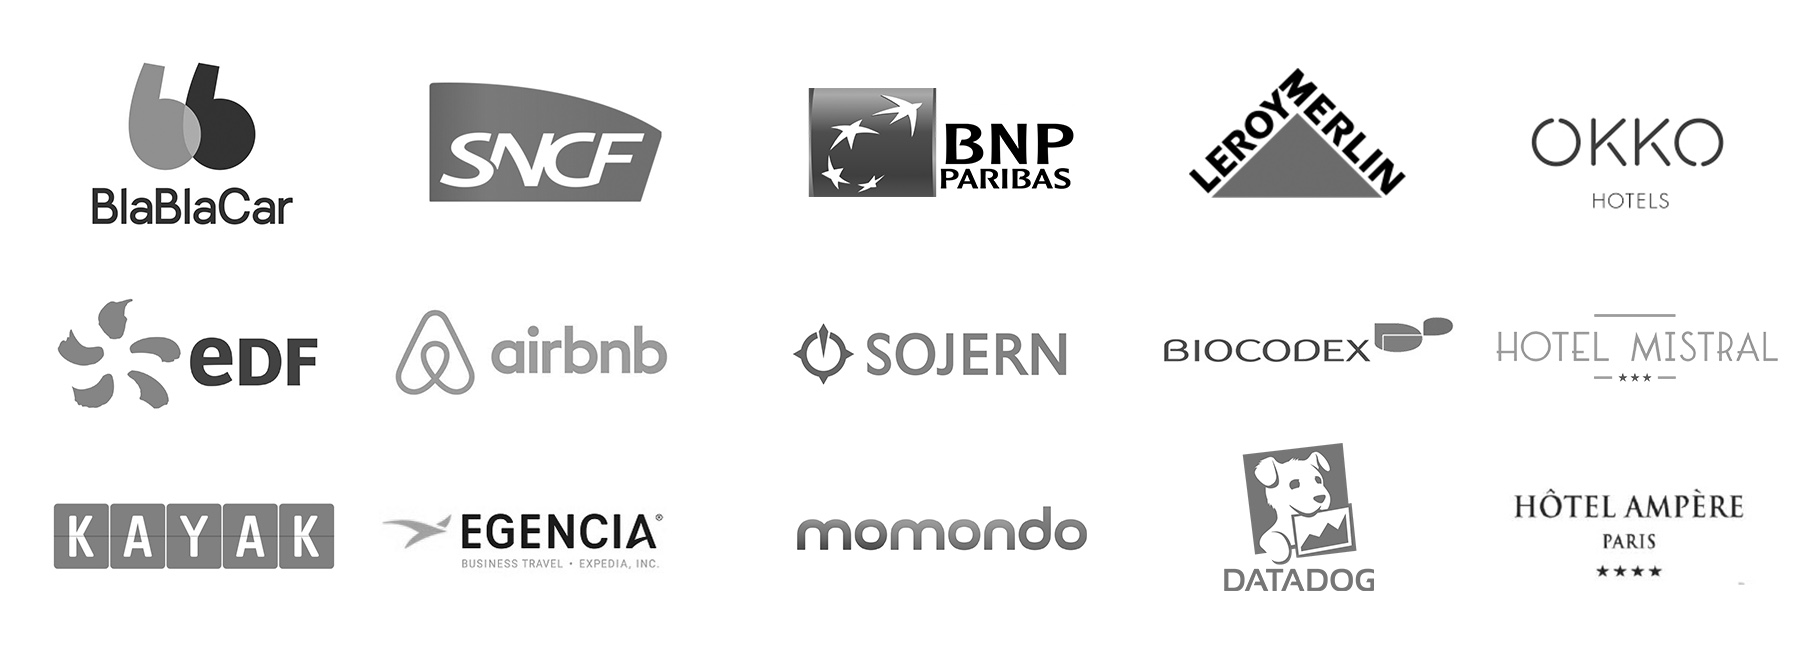 logo team building companies